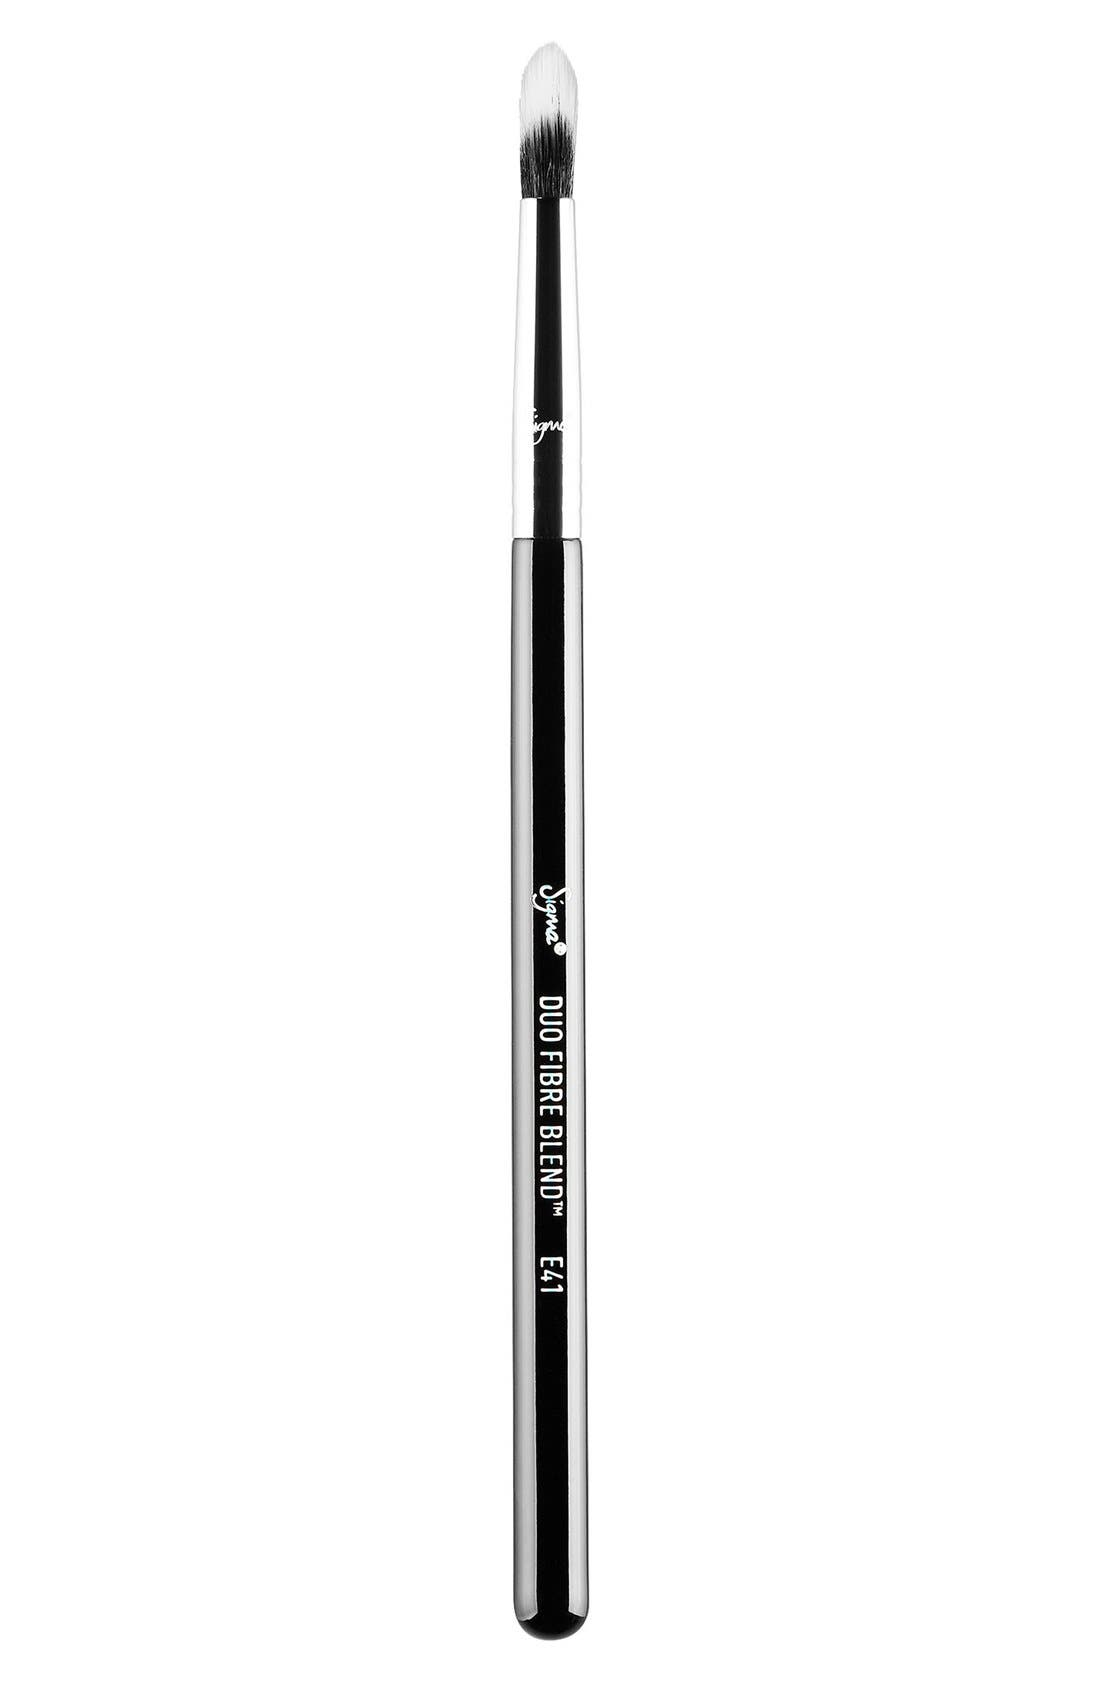 E41 Duo Fibre Blend Brush,                             Main thumbnail 1, color,                             NO COLOR